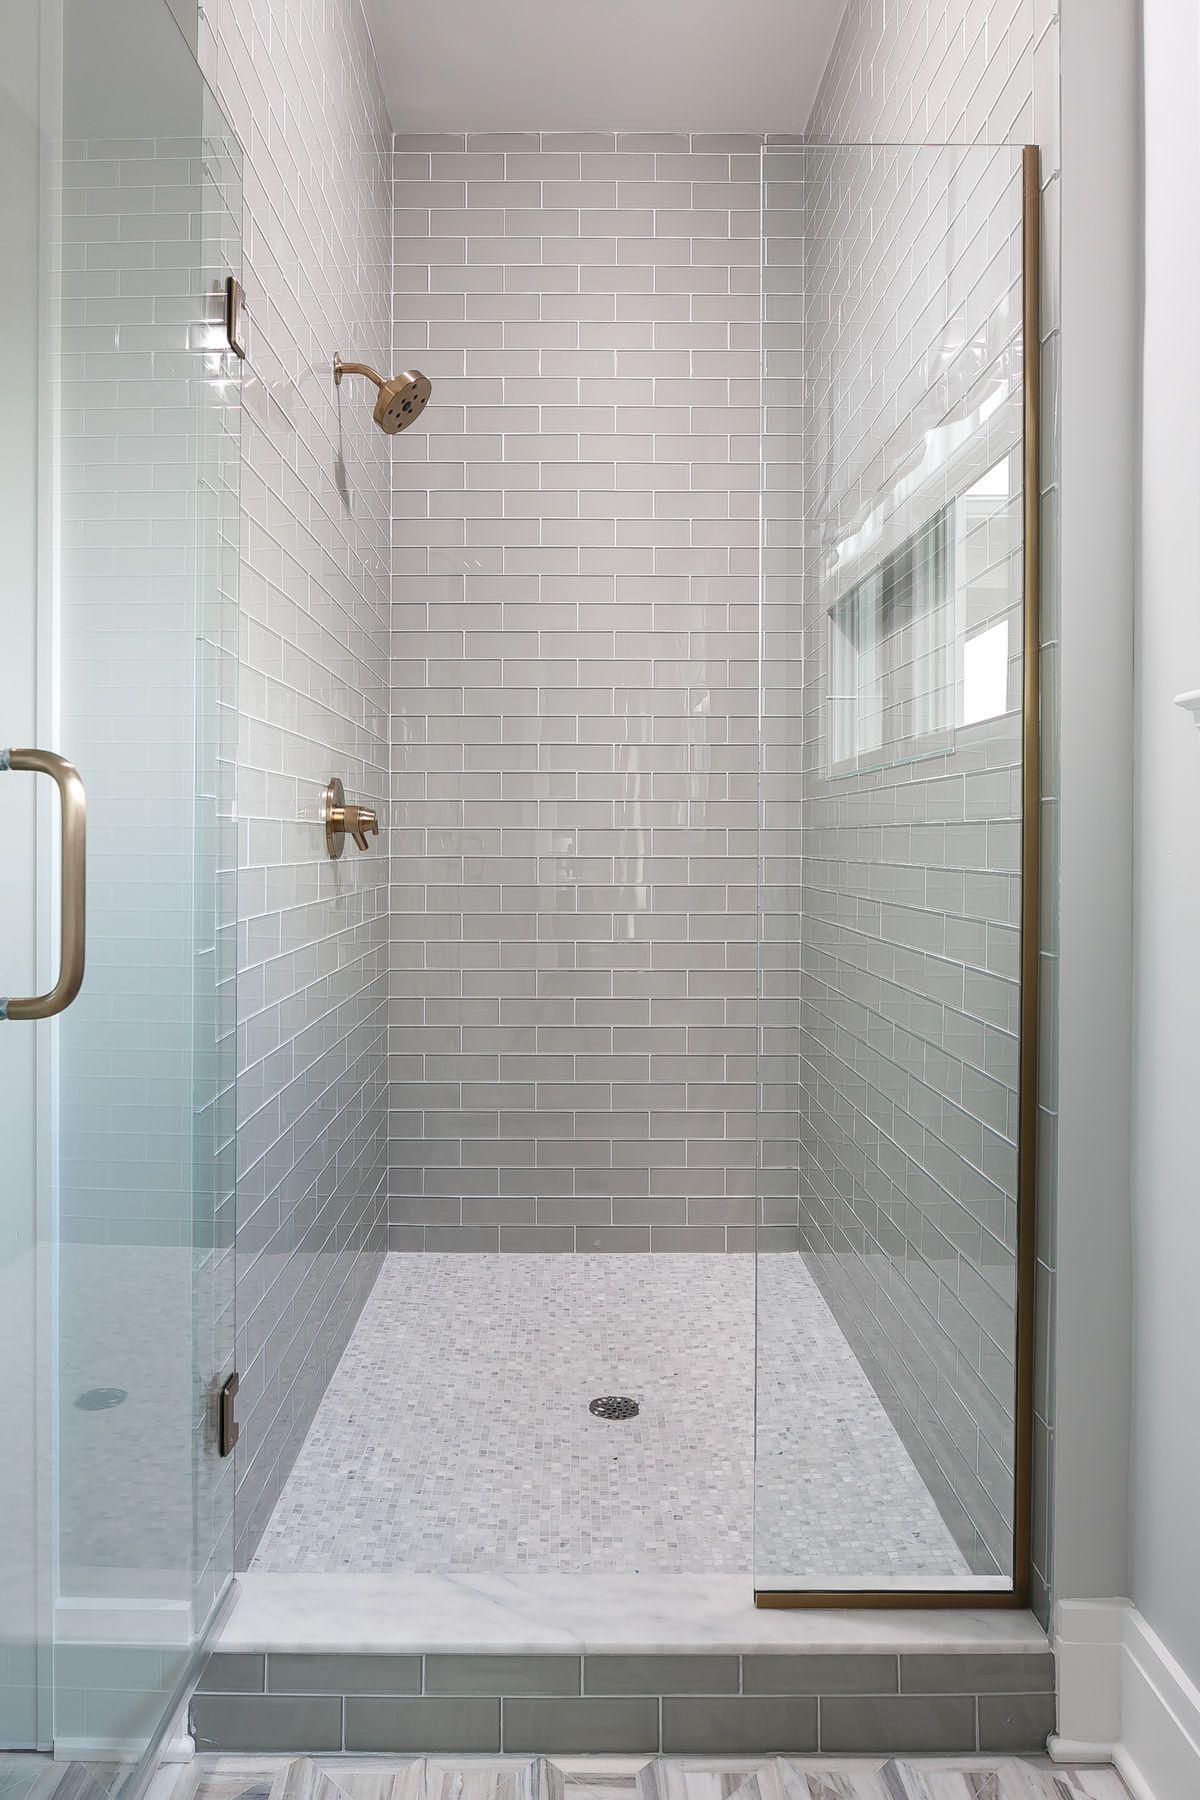 Bernadette Glass Tile Shower Subway Tile Showers Glass Subway